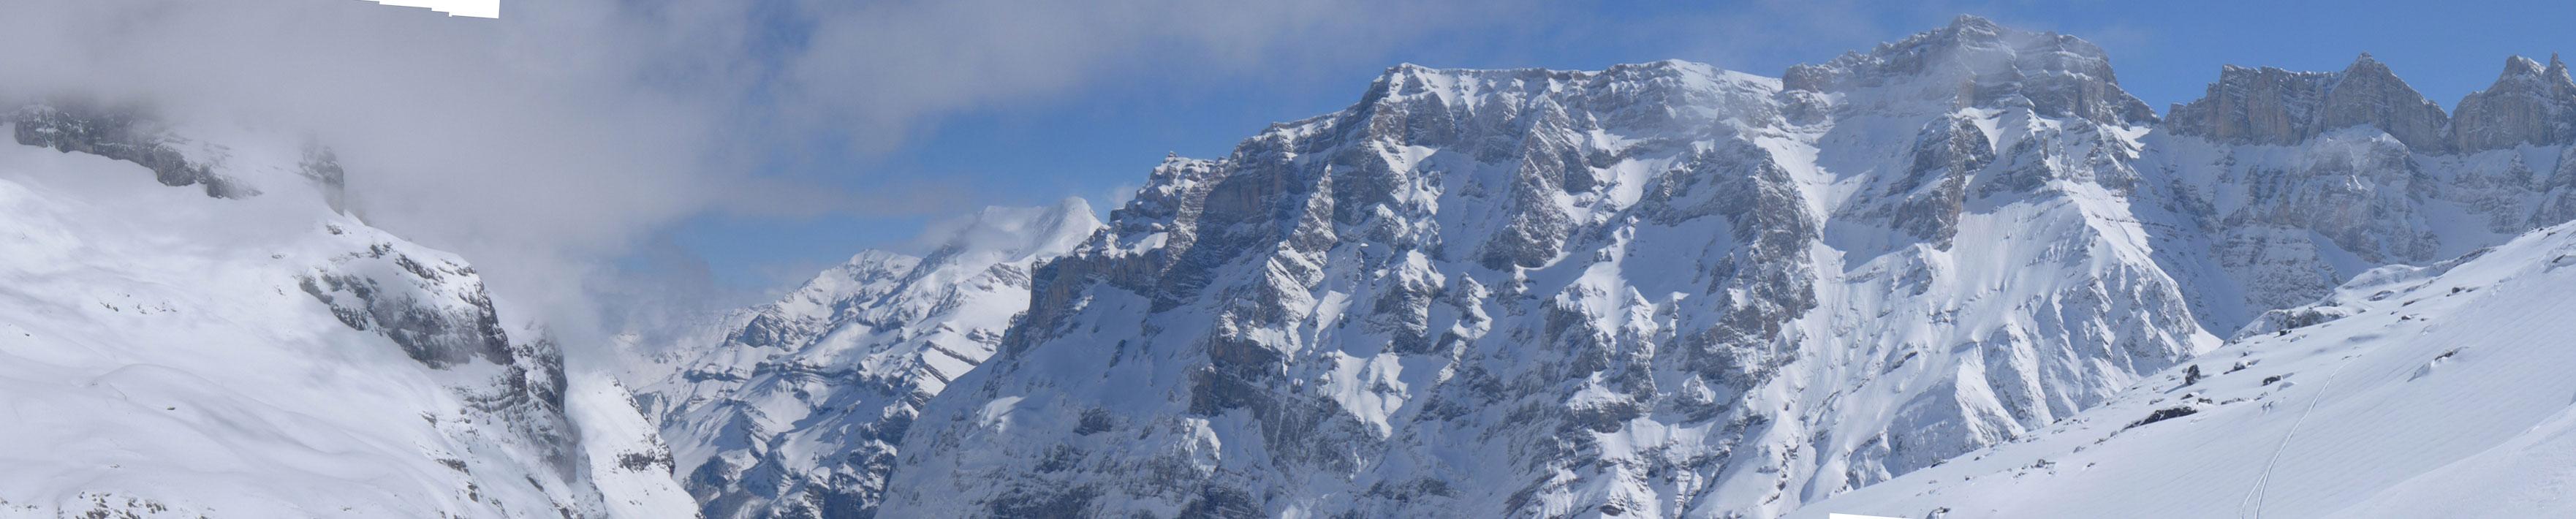 Fridolinshütte Glarner Alpen Switzerland panorama 35